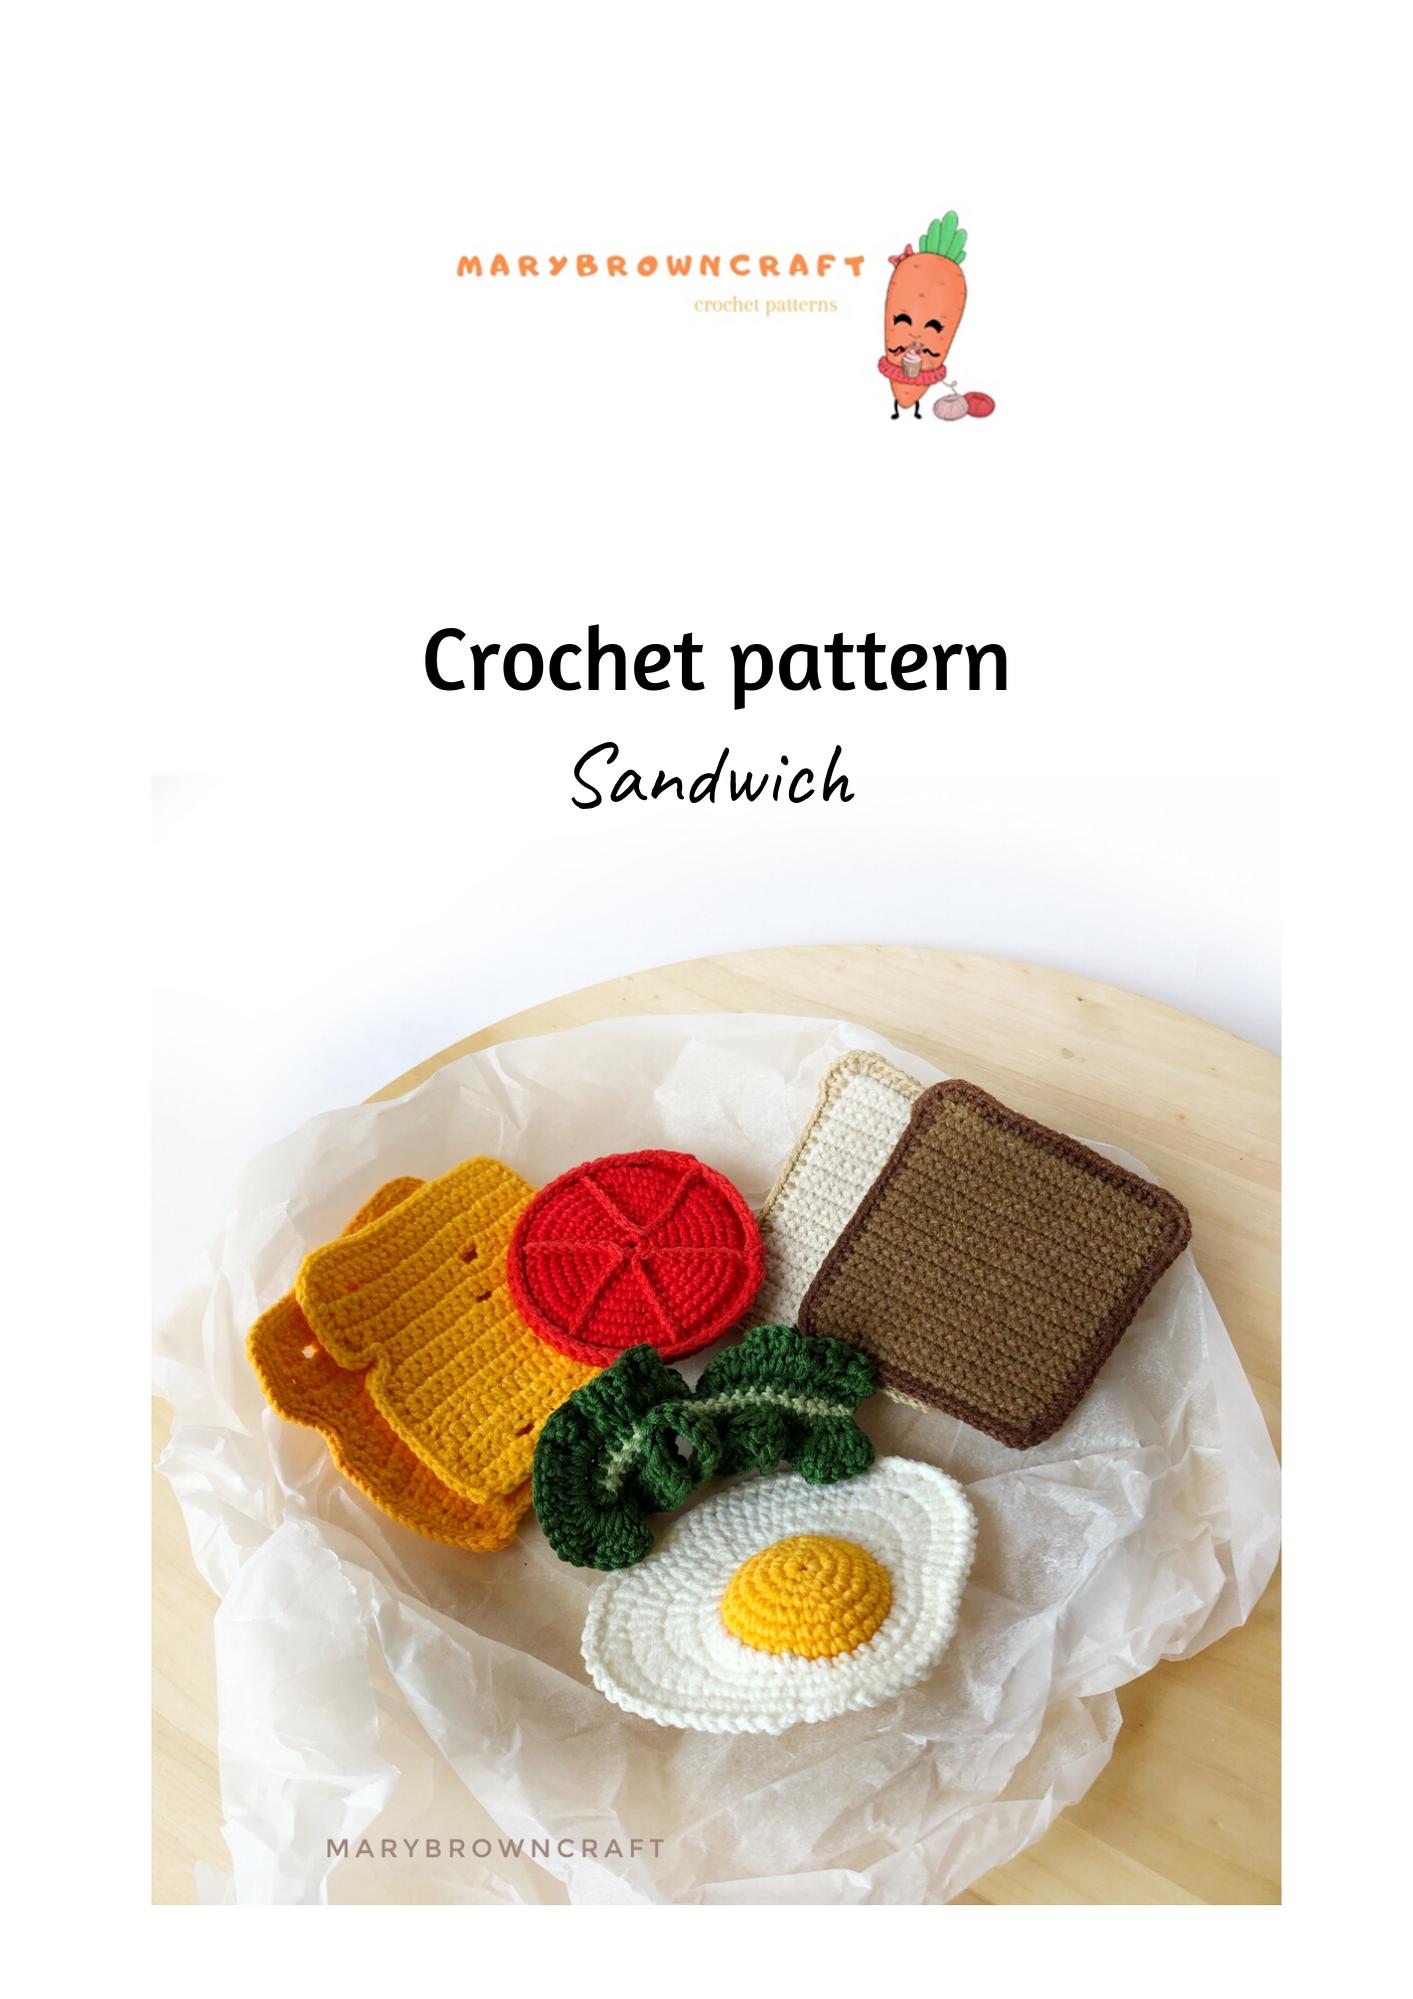 Beading #Crochet Crochet Food Cake, Crochet Food Drops Design, Crochet Food Ke ...